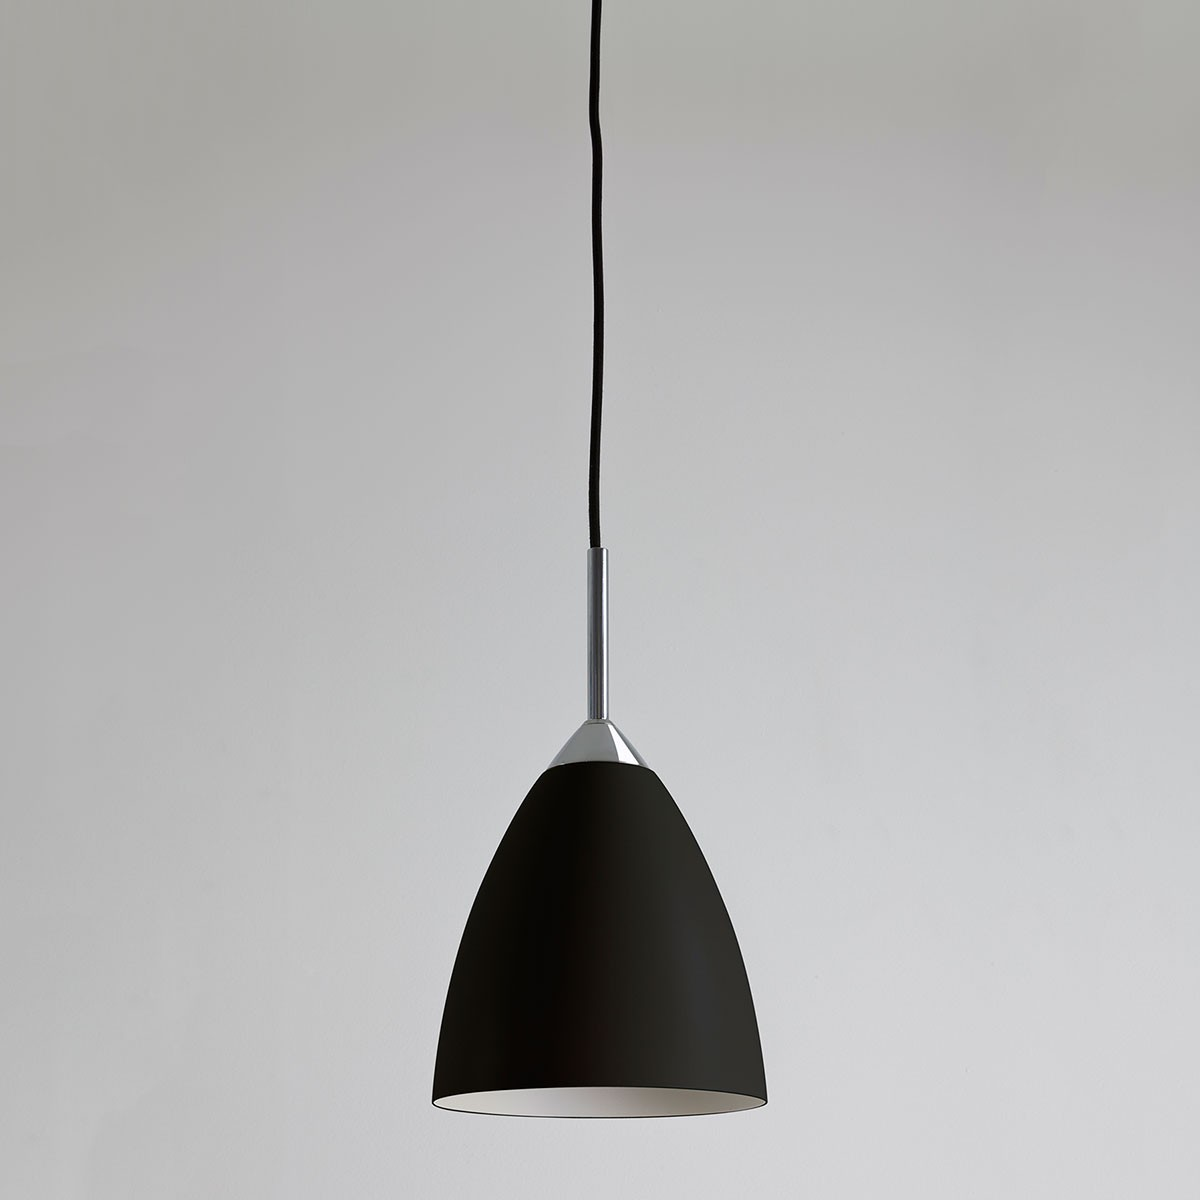 Astro joel black and polished chrome pendant light at uk electrical astro joel black and polished chrome pendant light aloadofball Gallery